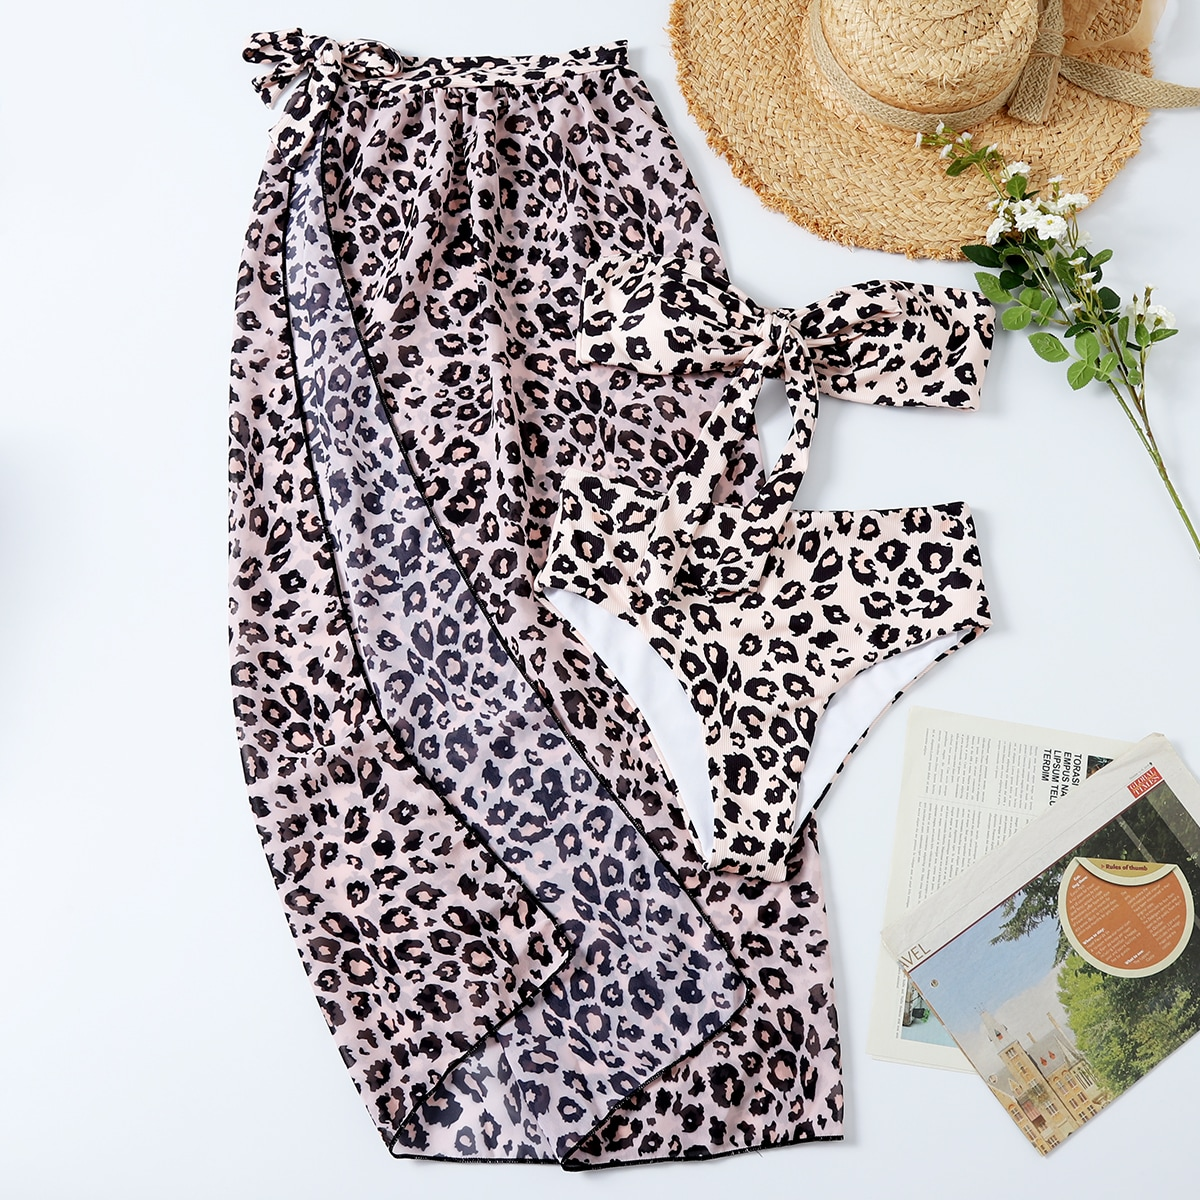 SHEIN / 3pack Leopard Bandeau Bikini Swimsuit & Beach Skirt